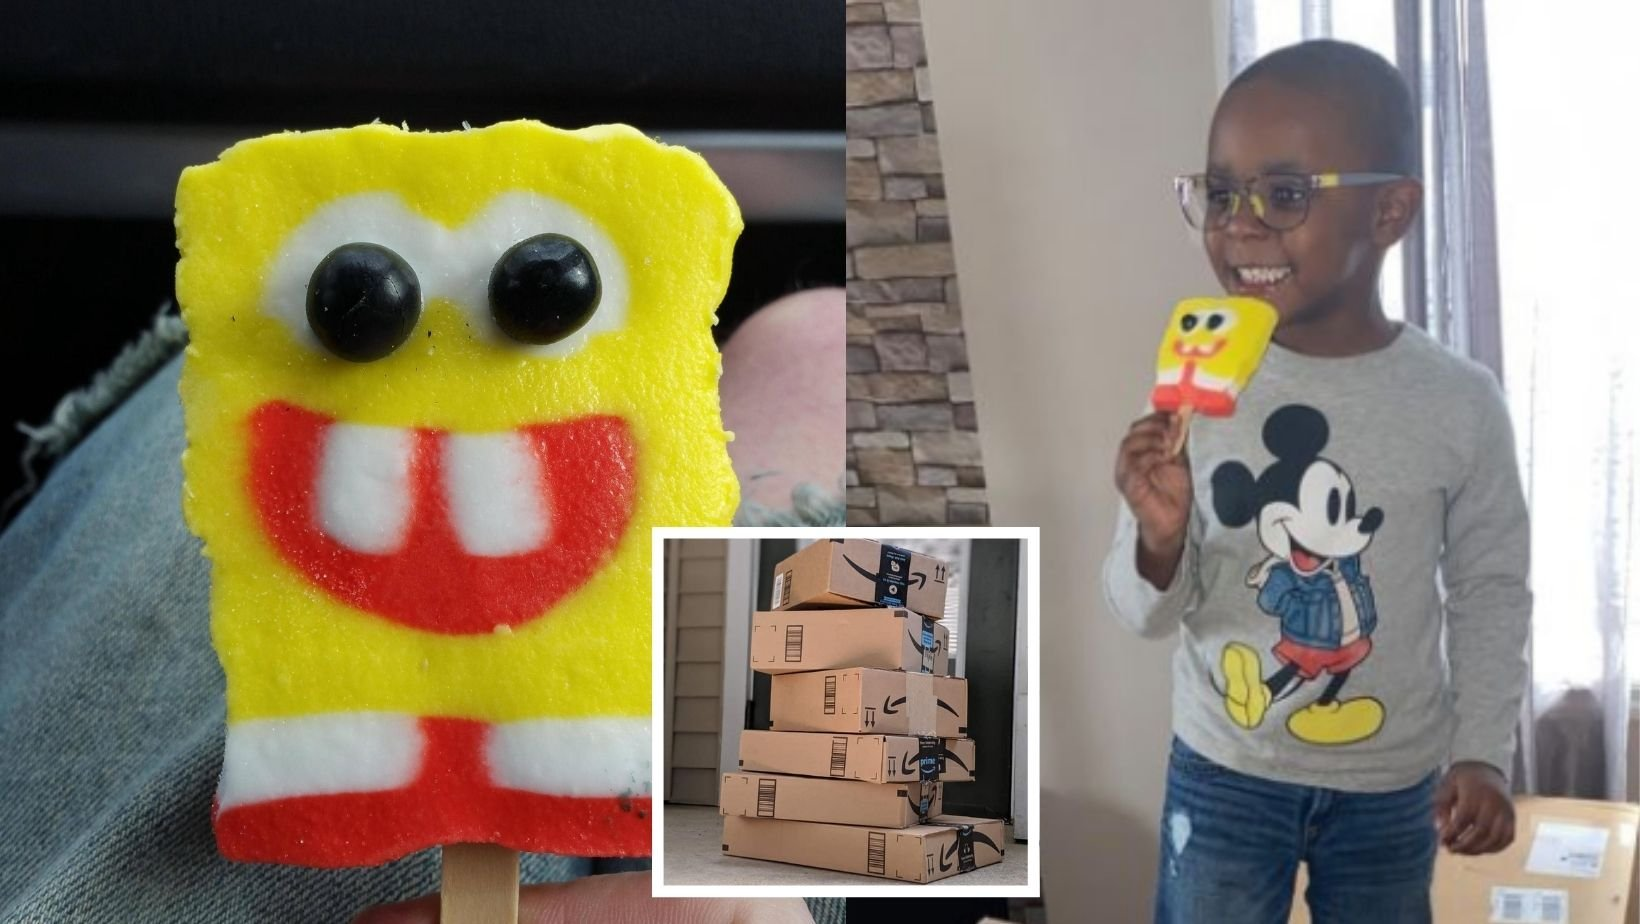 1 39.jpg?resize=1200,630 - Boy Accidentally Orders $2,600 Worth of SpongeBob Popsicles On Amazon